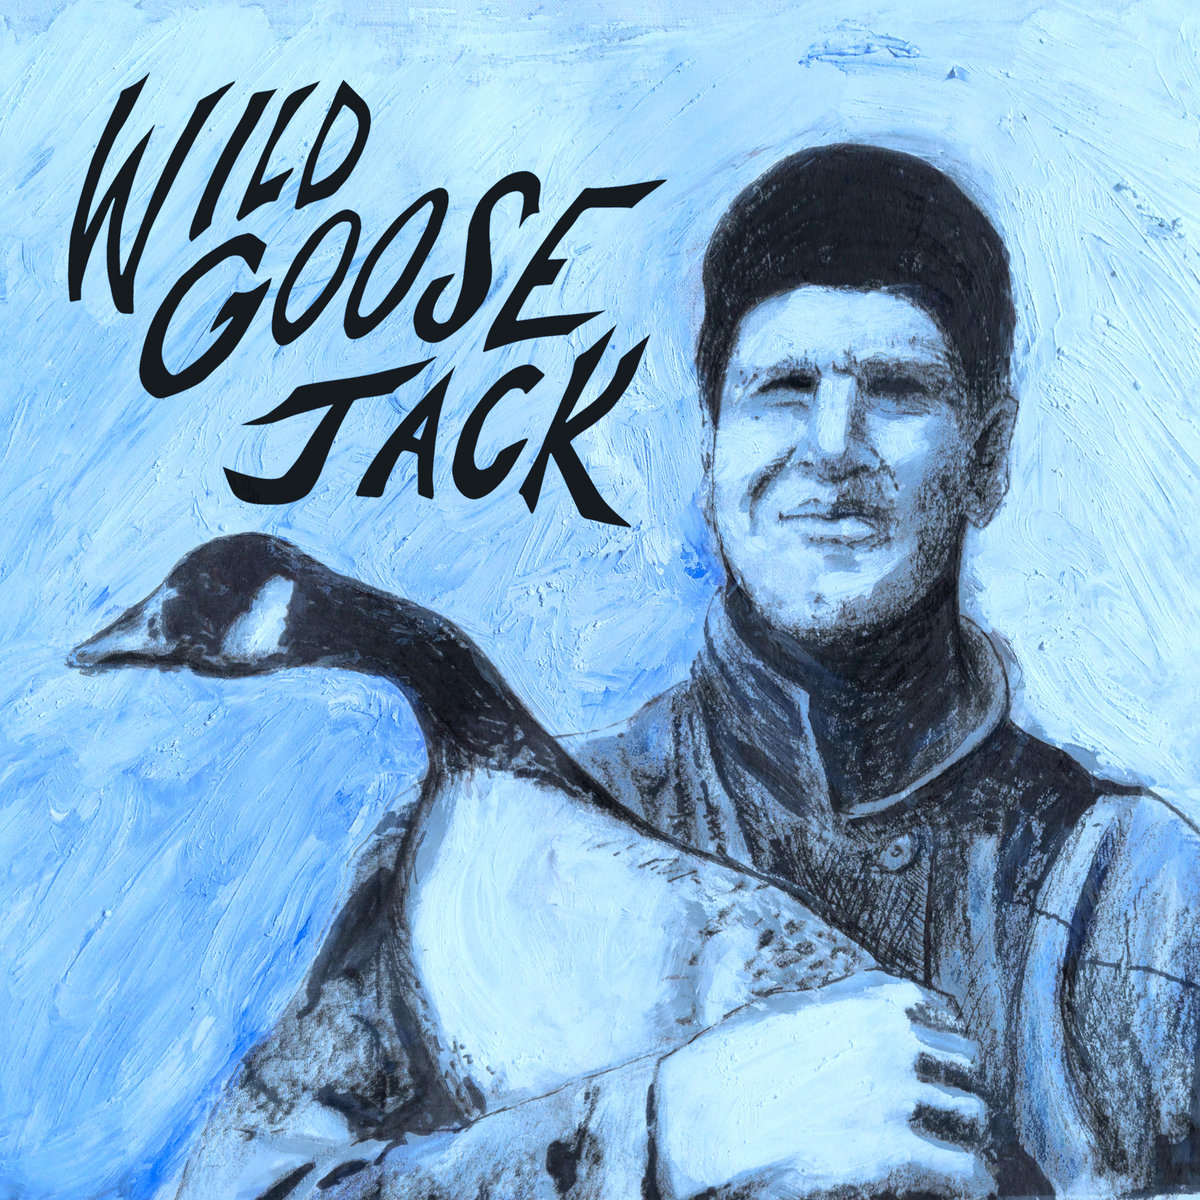 James OL & The Villains - Wild Goose Jack